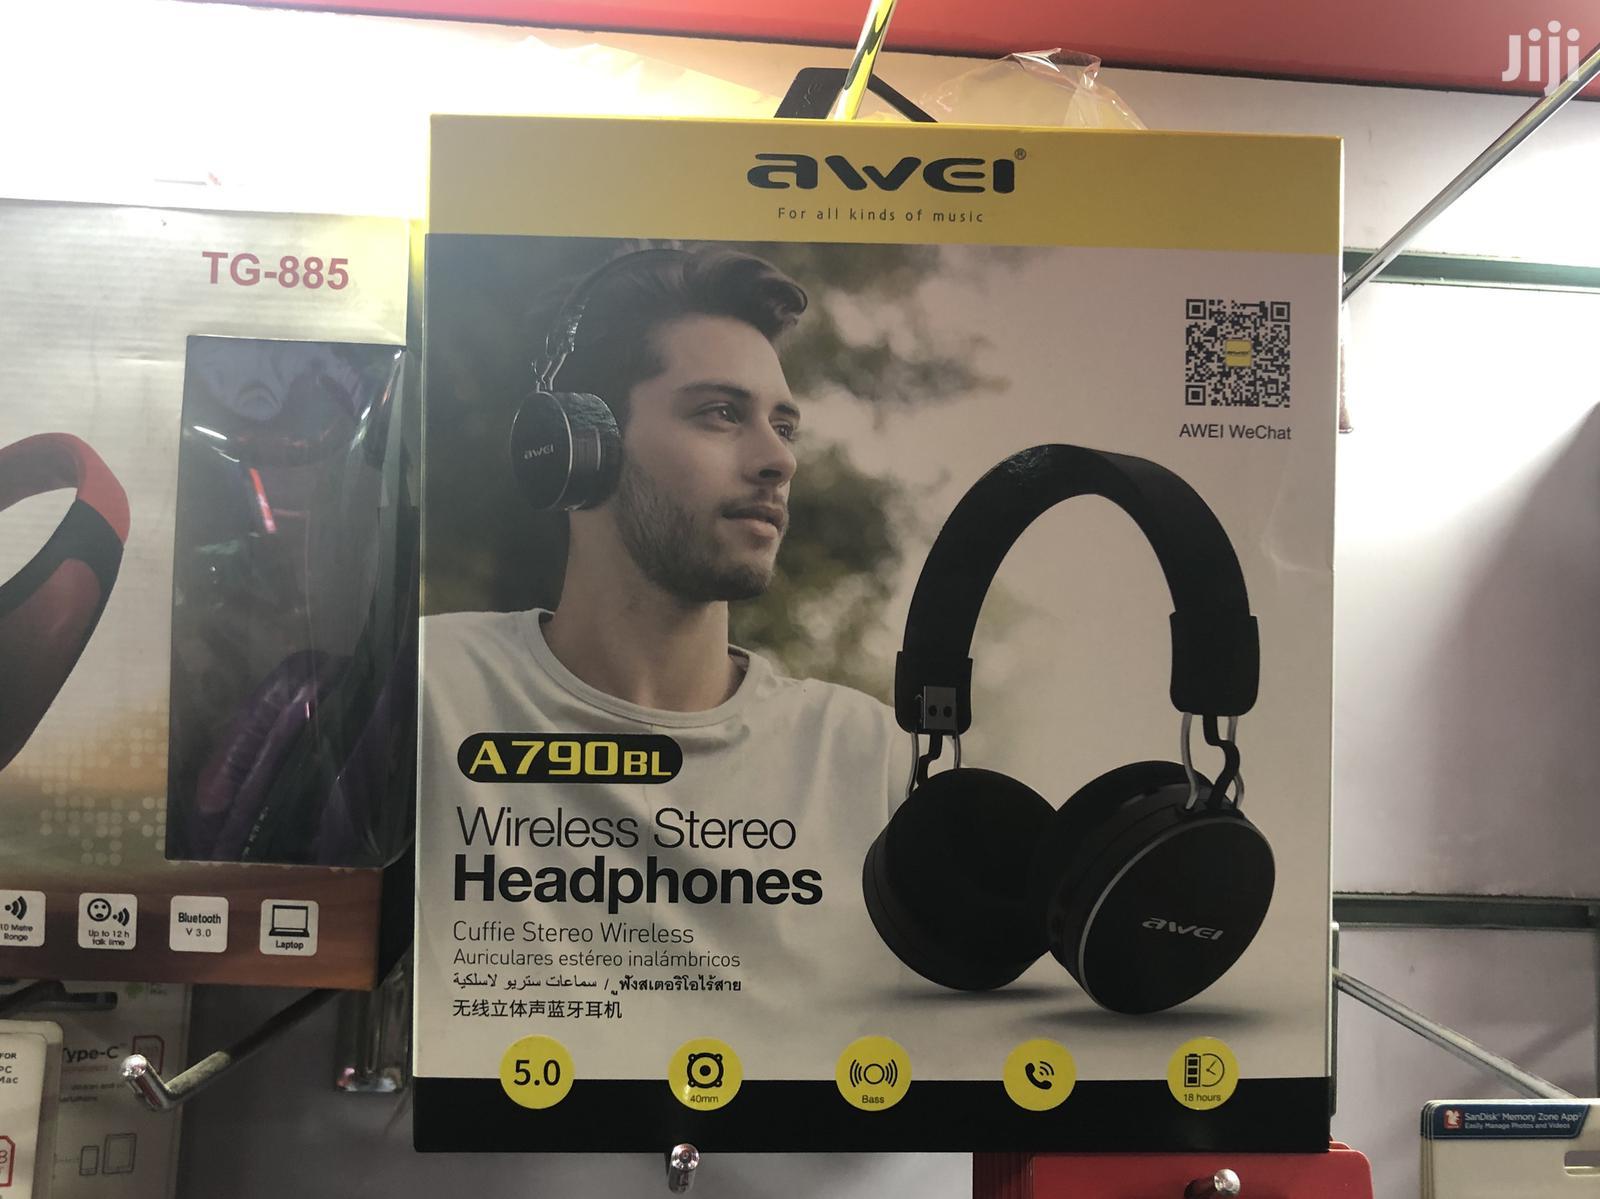 Awei Bluetooth Headphone A790 Bl | Headphones for sale in Nairobi Central, Nairobi, Kenya